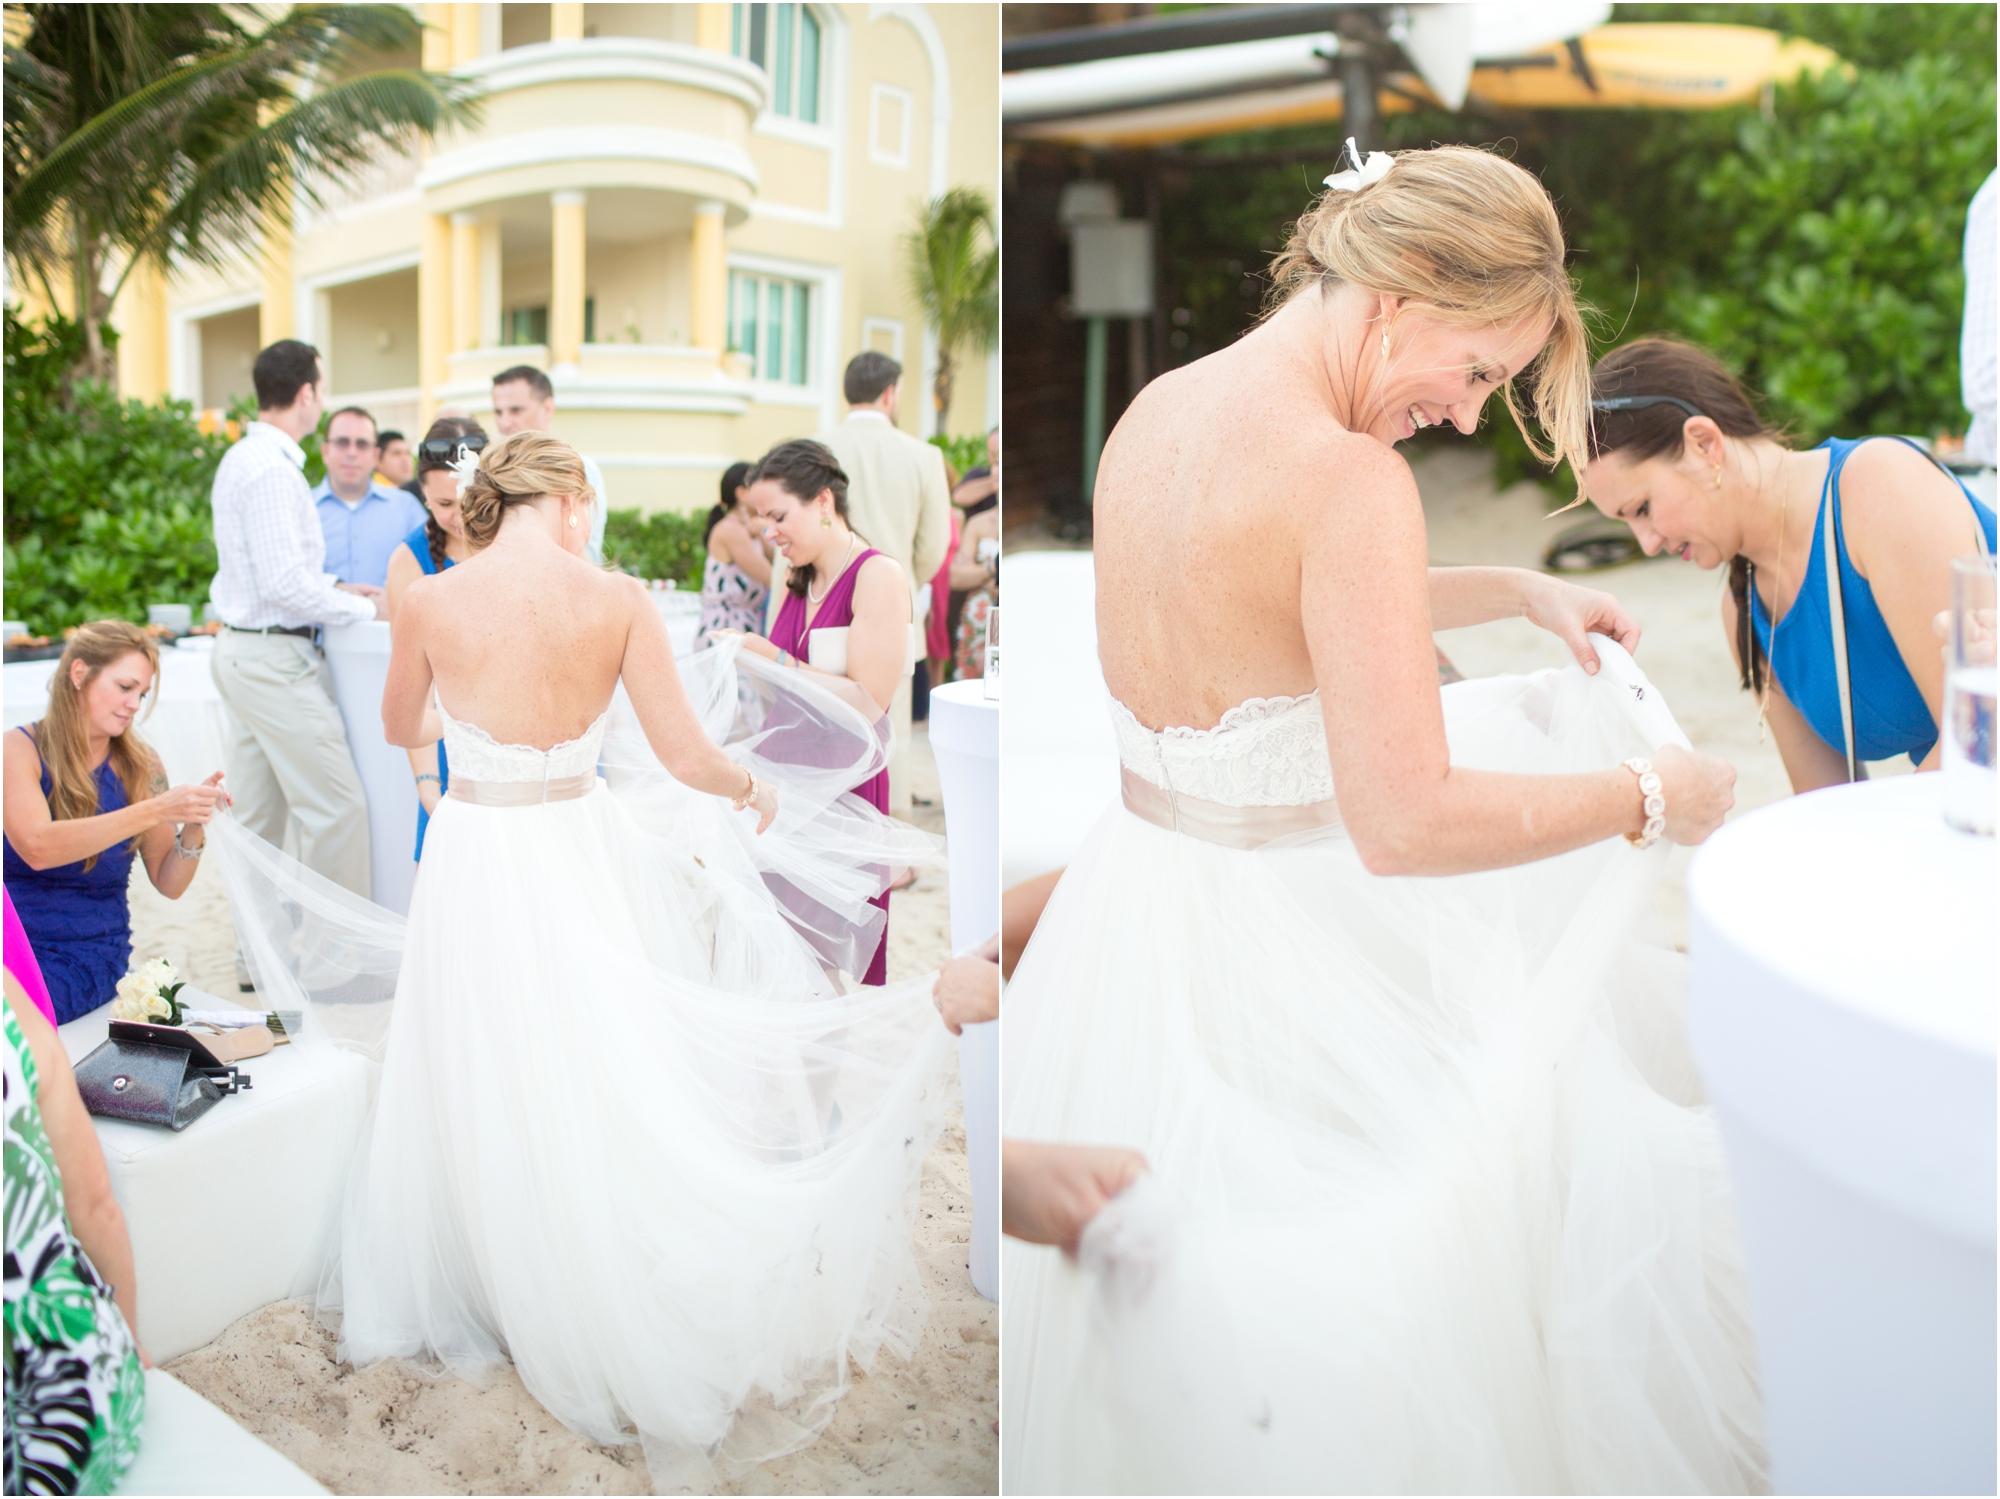 Morosoff Wedding 4-Bride & Groom Portraits-507_anna grace photography destination wedding photographer playa del carmen mexico photo.jpg